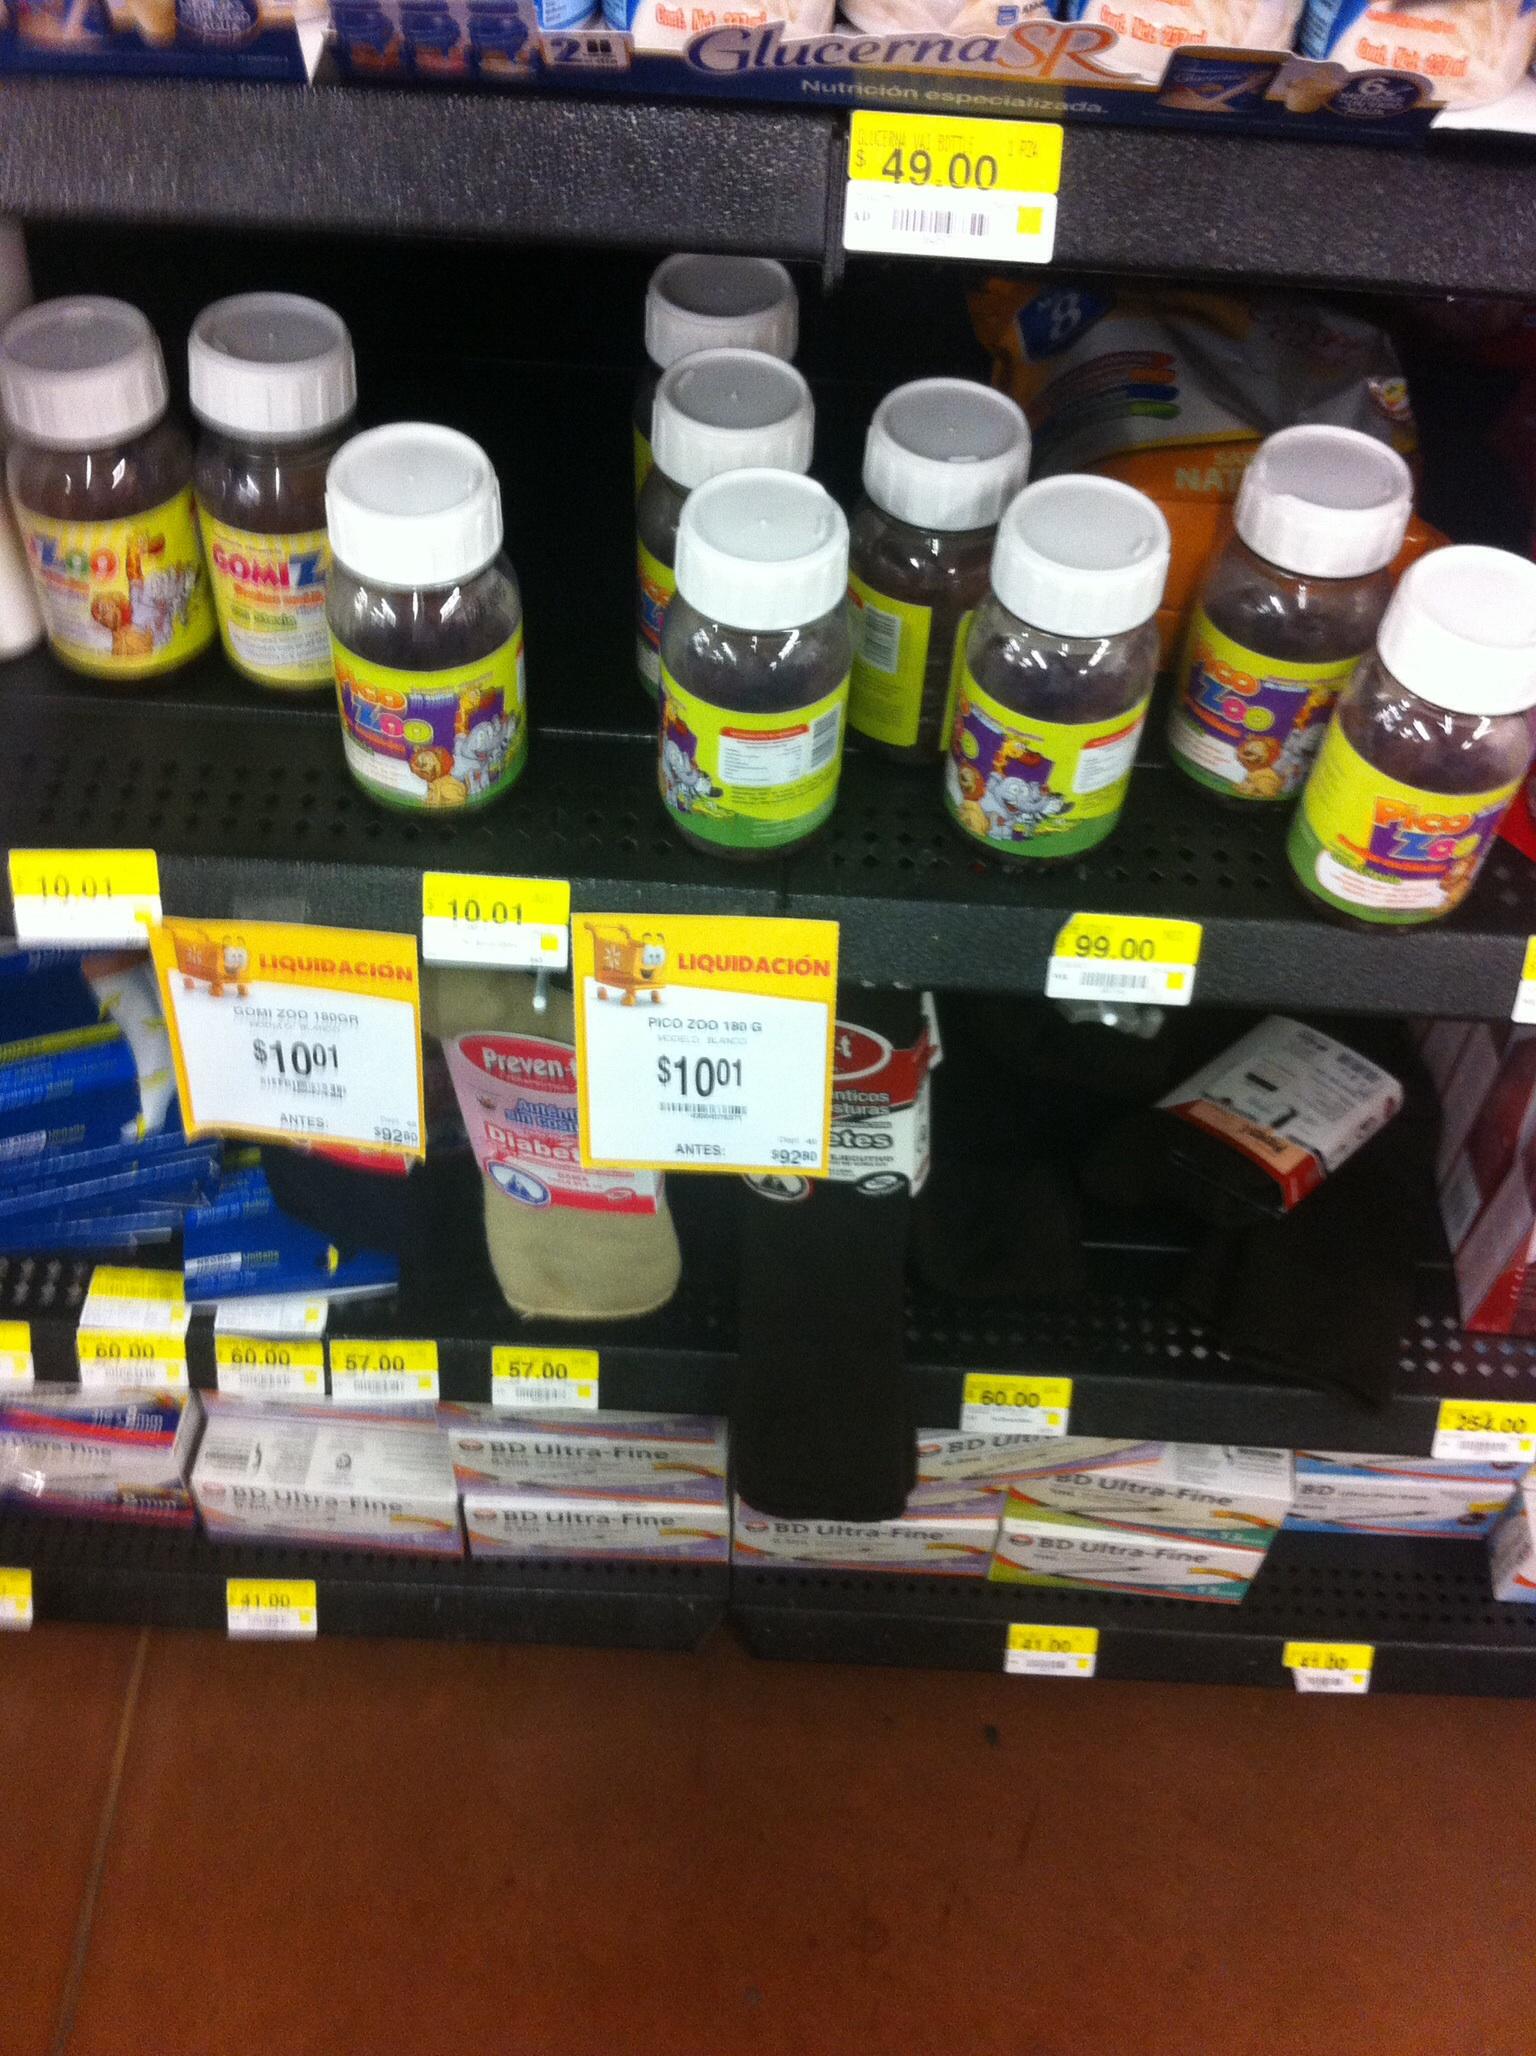 Walmart: Vitaminas en gomitas $10.01